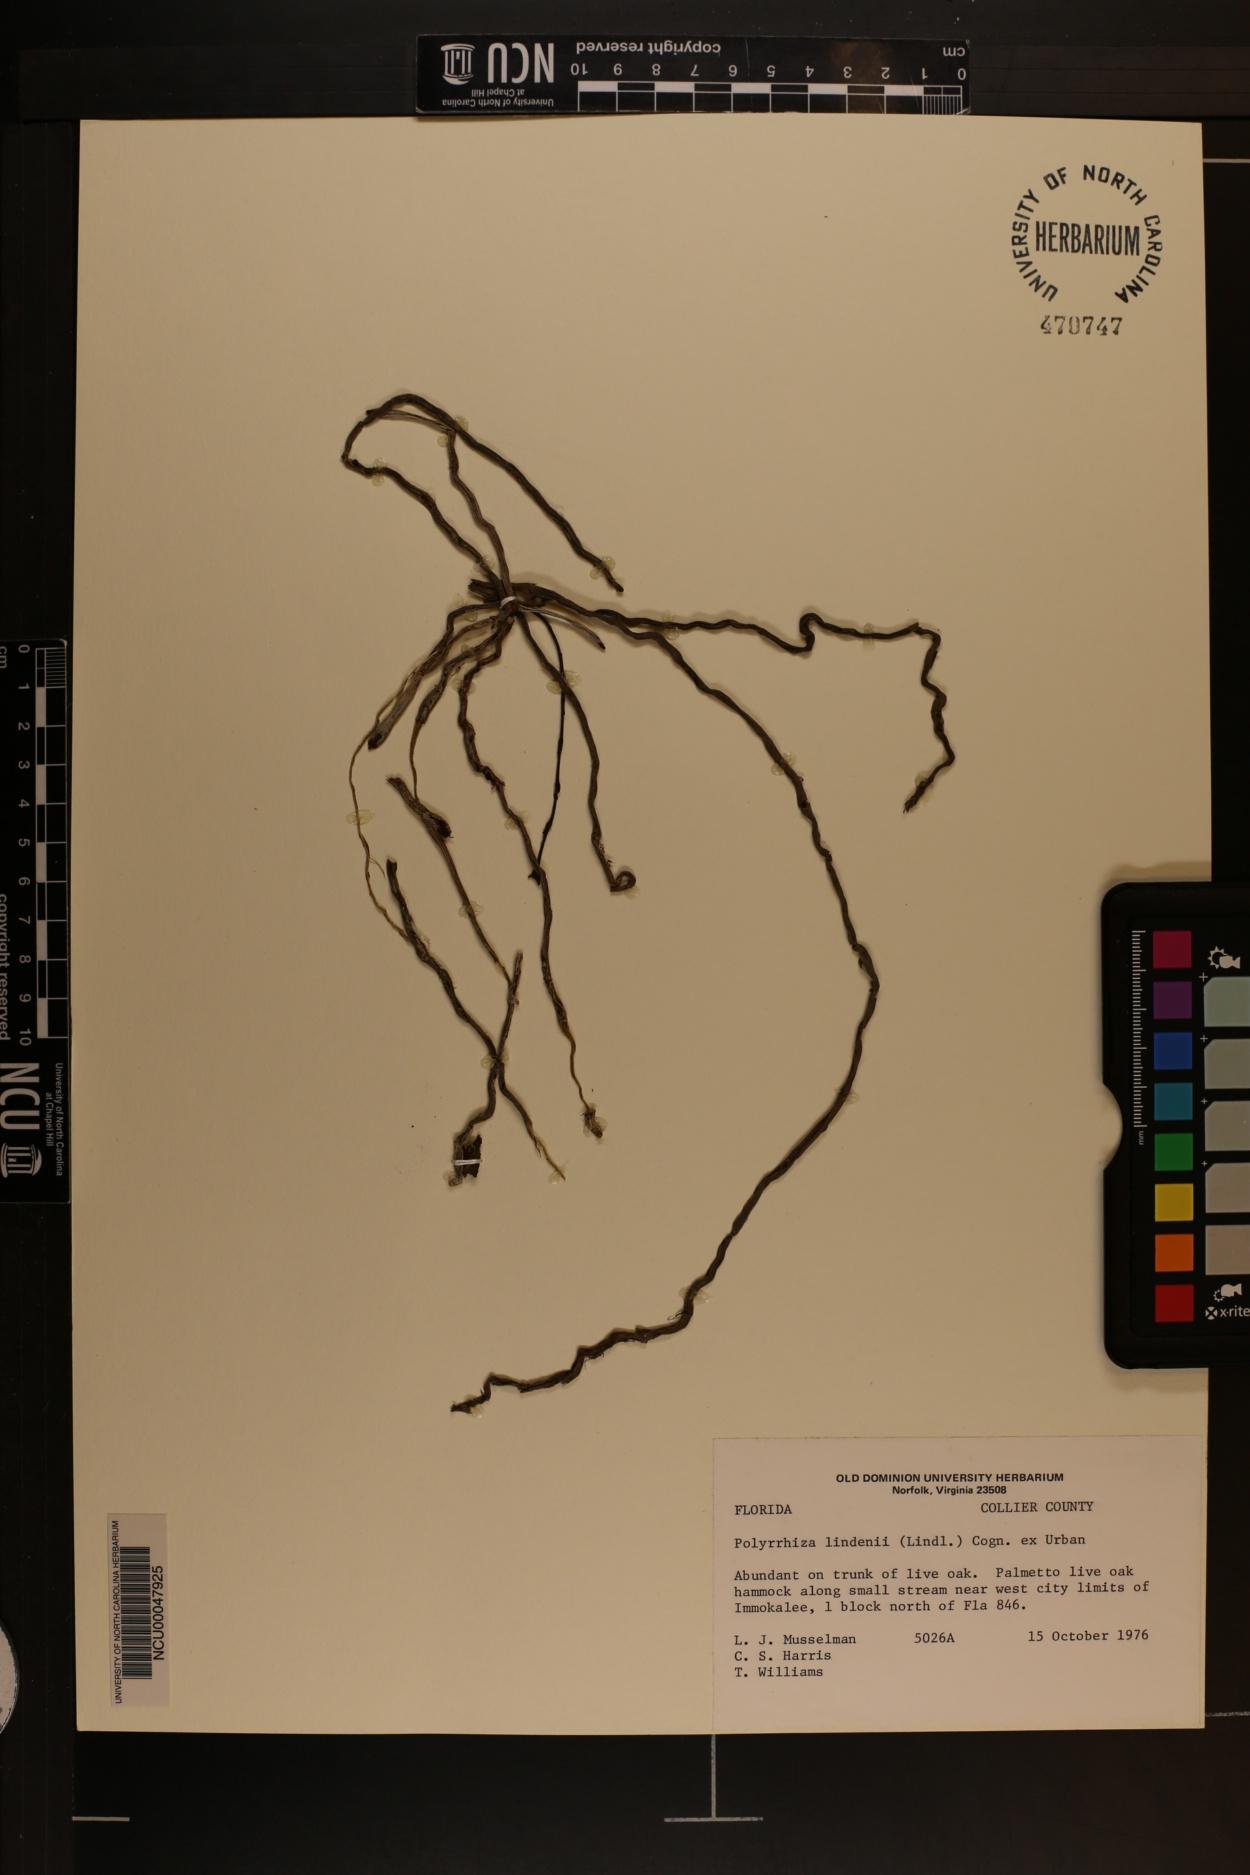 Polyradicion lindenii image